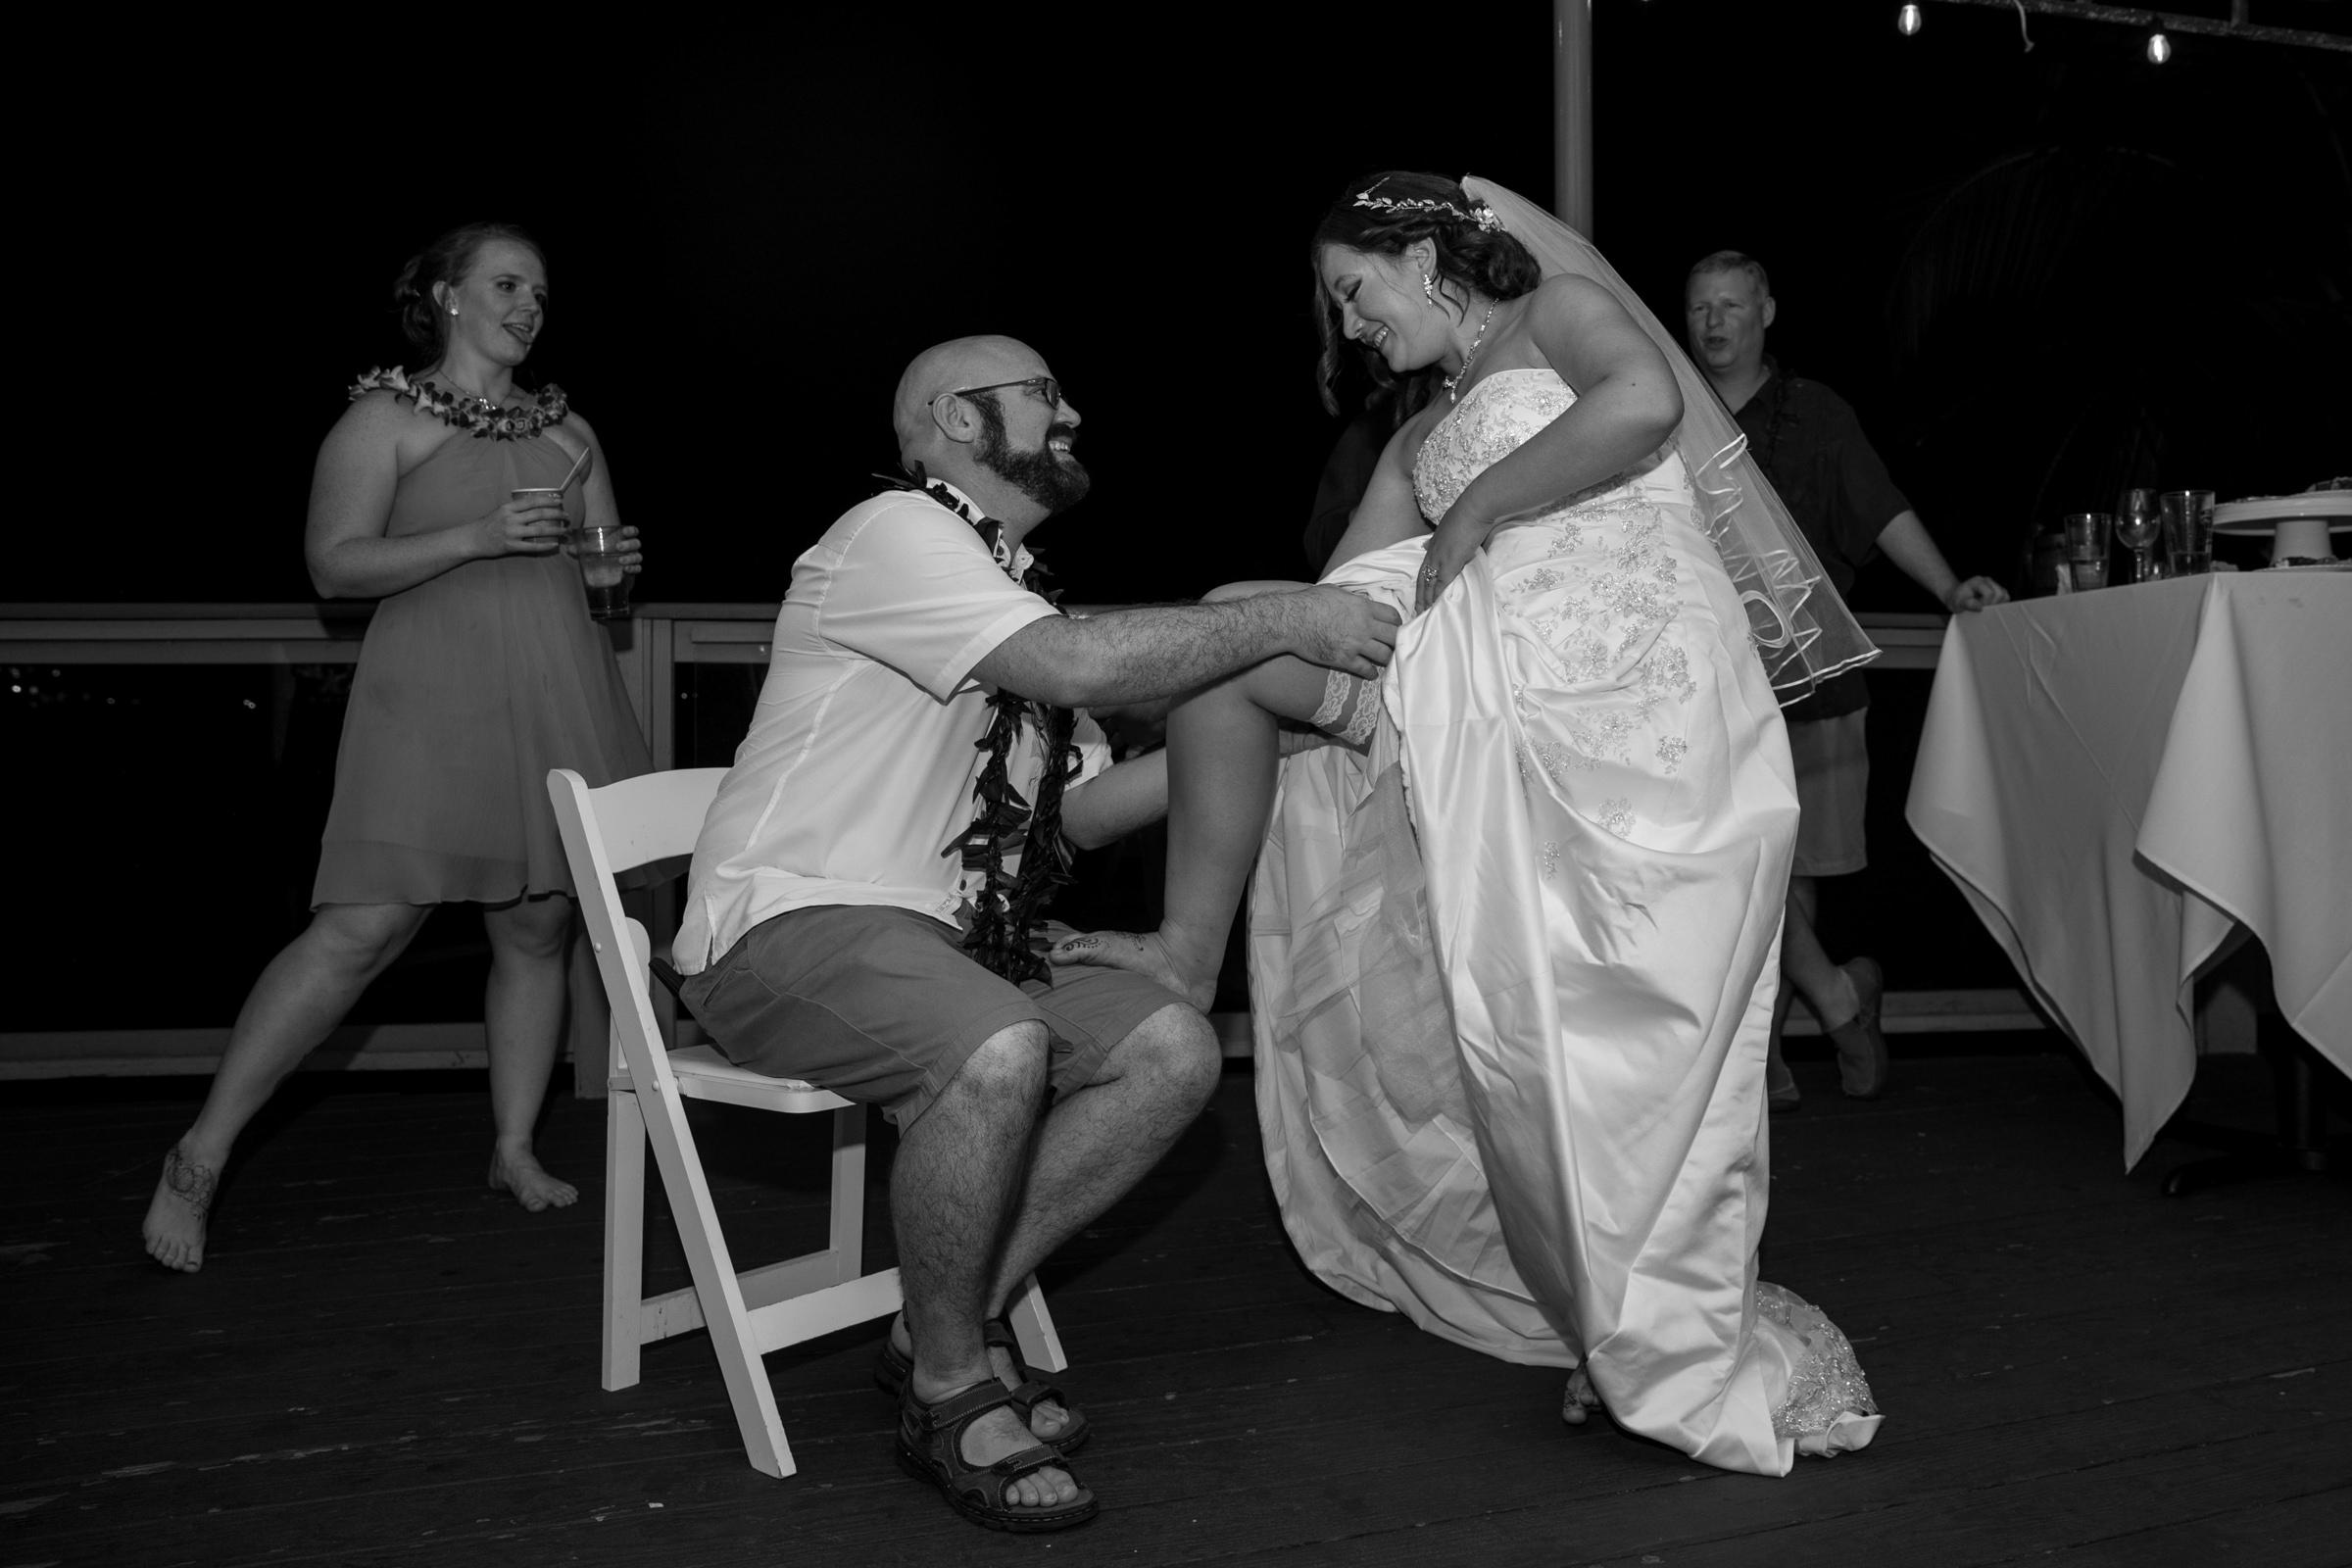 wedding-photographer-photography-destination-hawaii-lake-tahoe-reception-garter